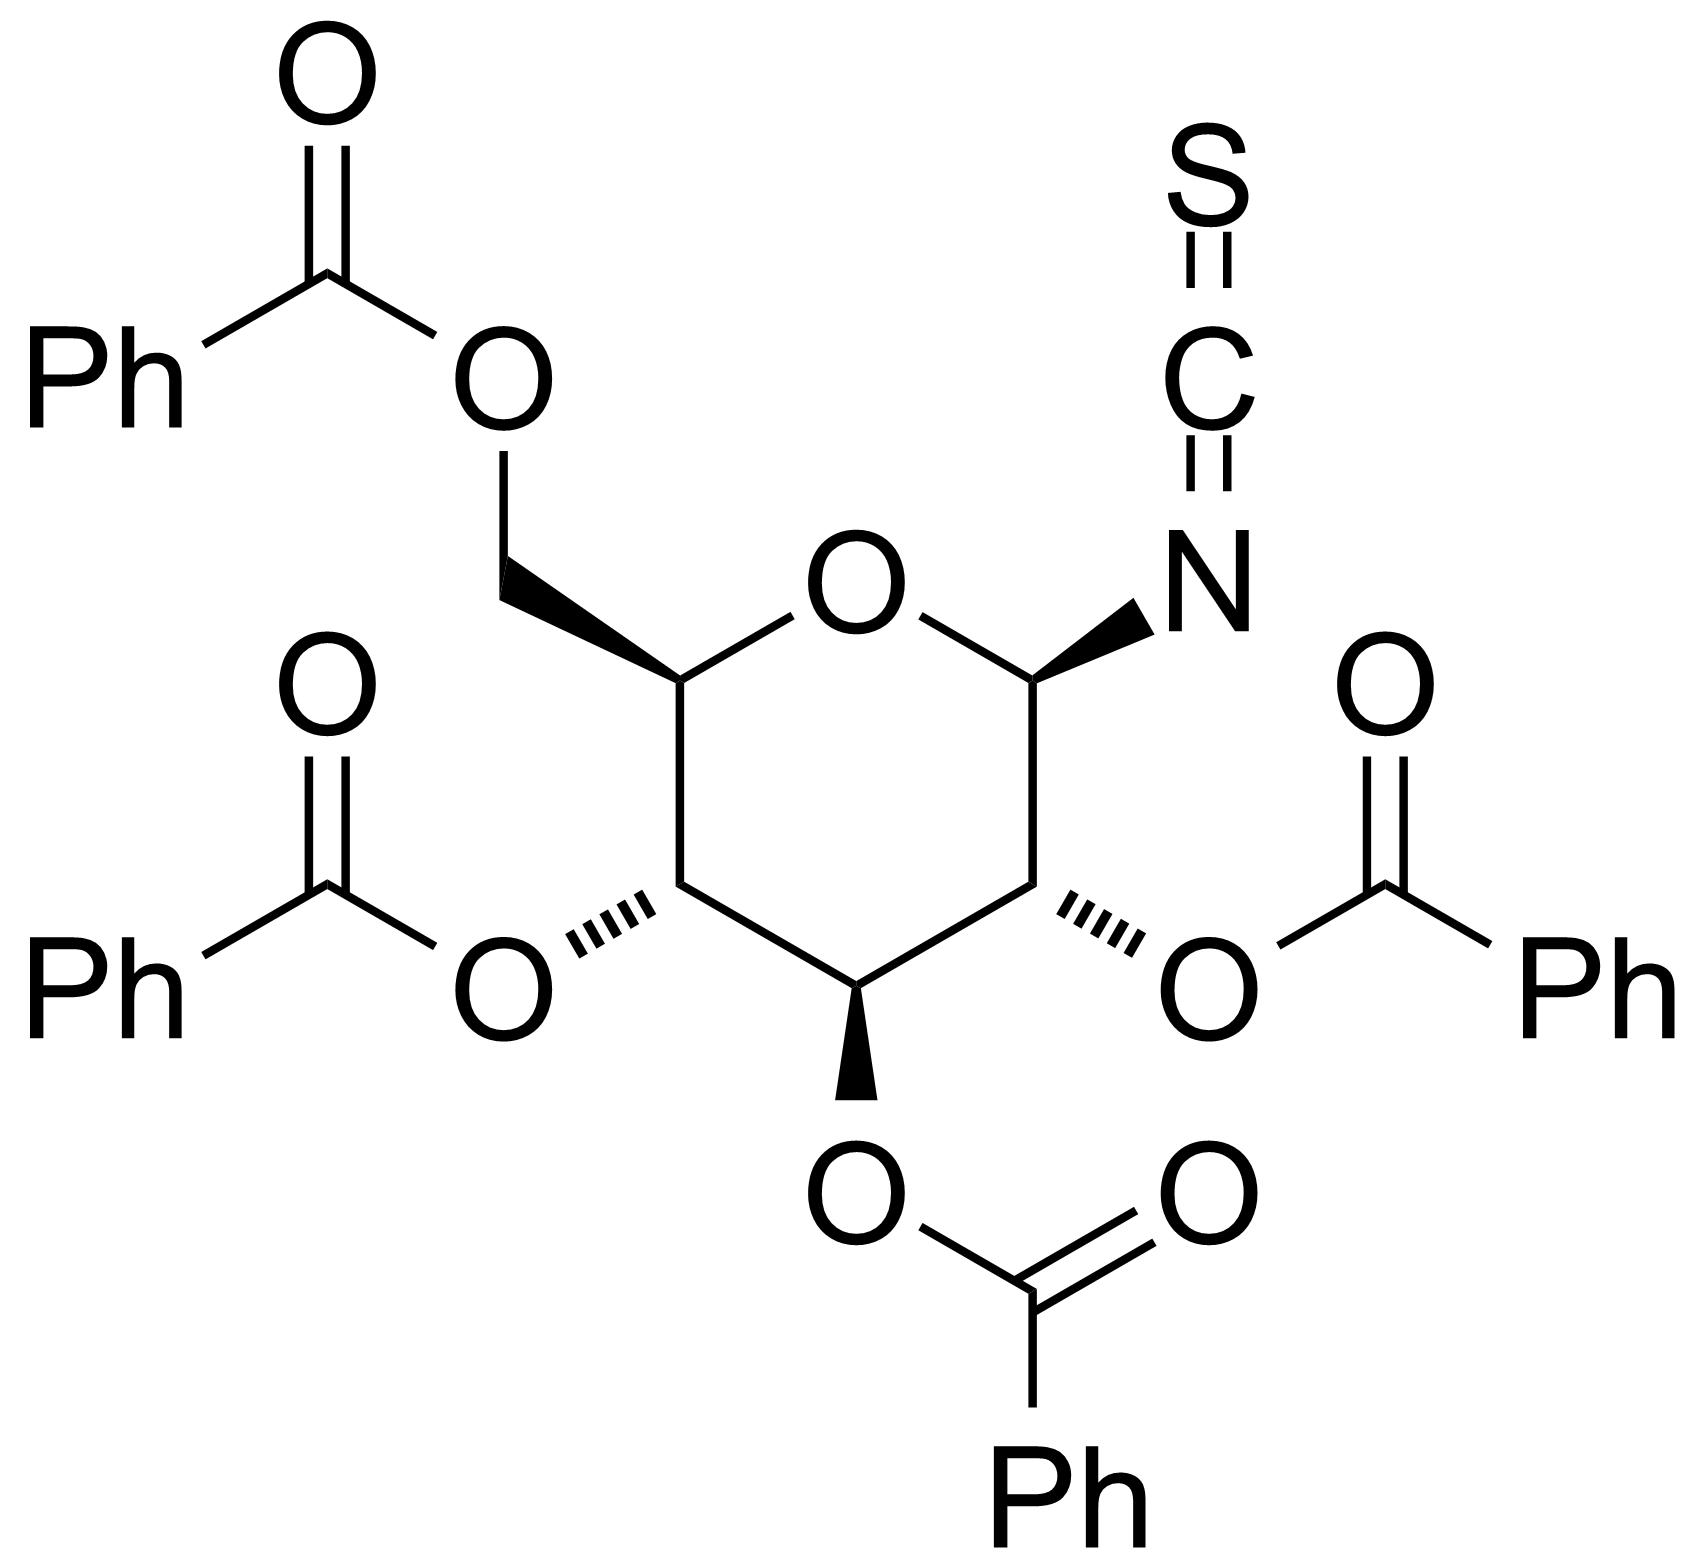 Structure of 2,3,4,6-Tetra-O-benzoyl-b-D-glucopyranosyl isothiocyanate